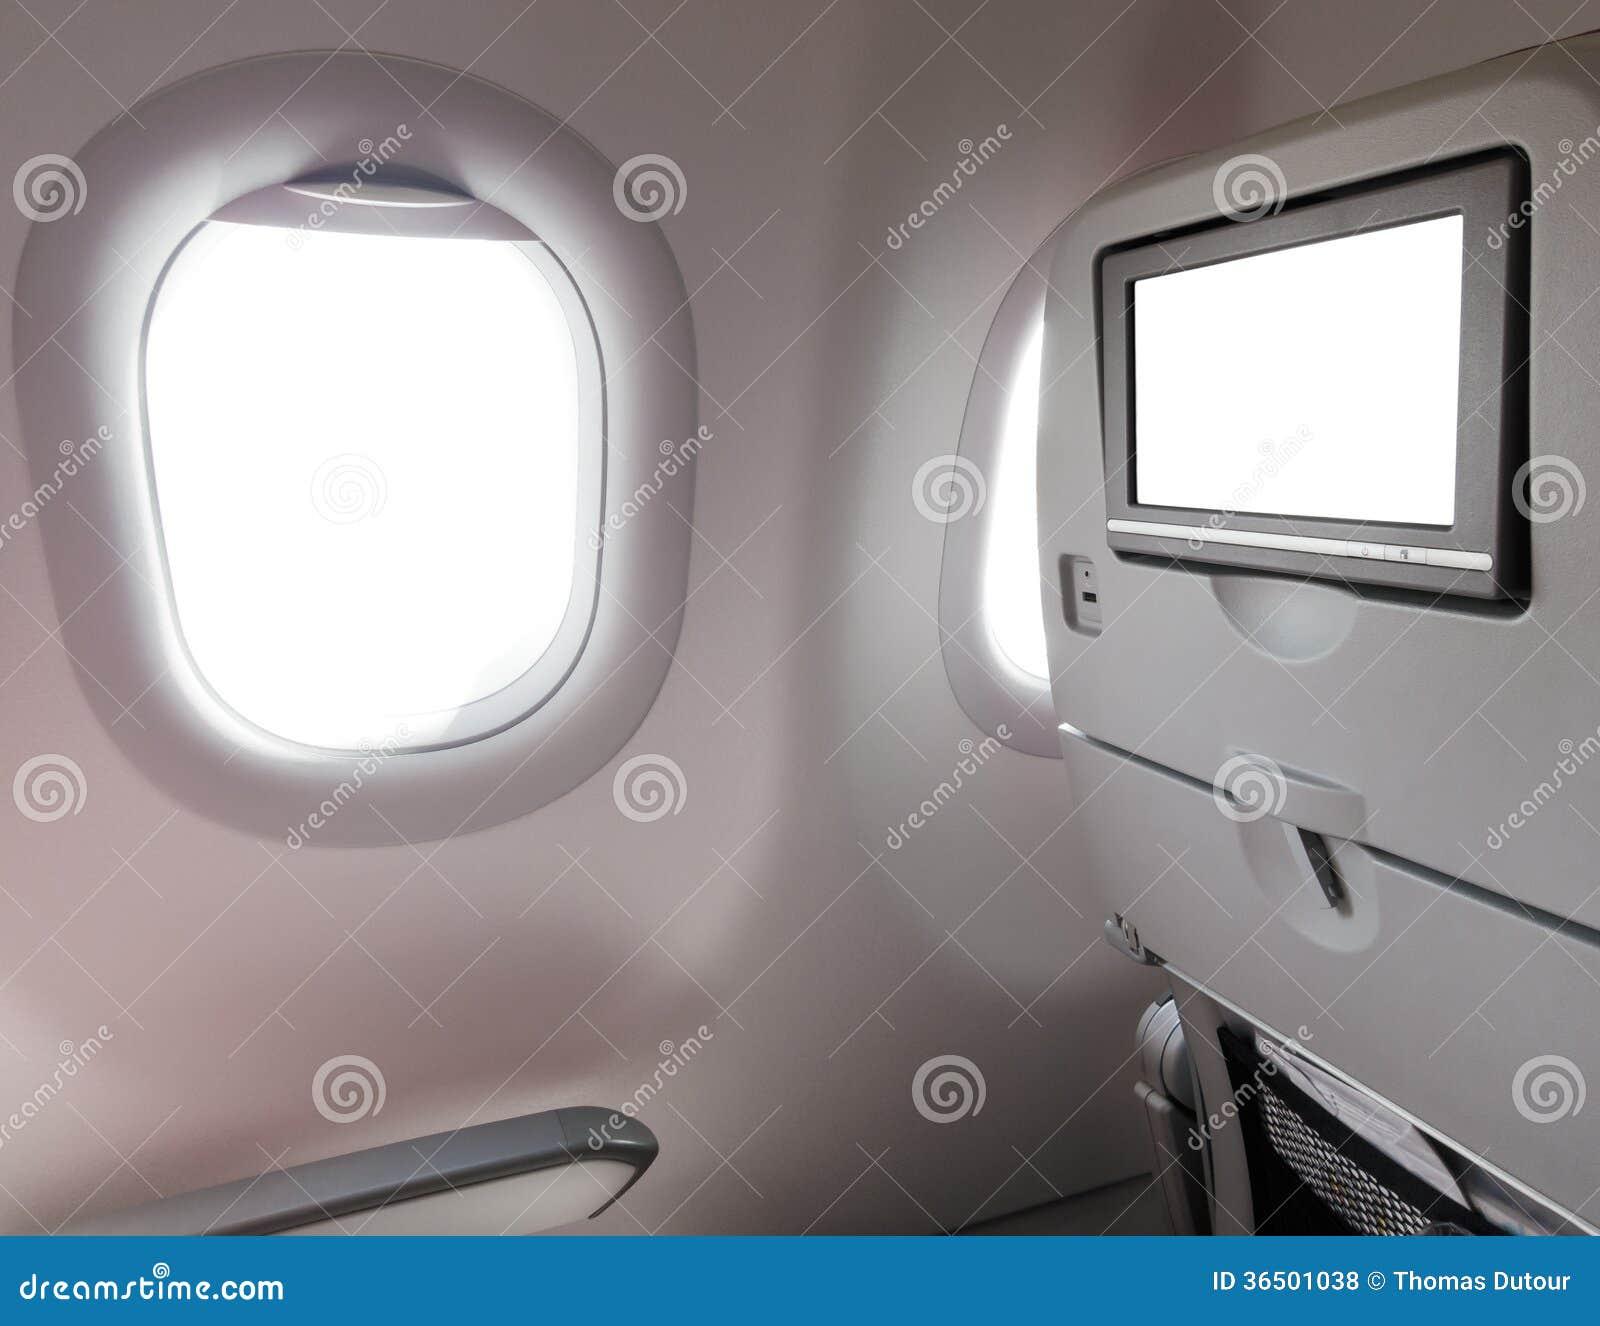 Window Seat Royalty Free Stock Photos Image 36501038